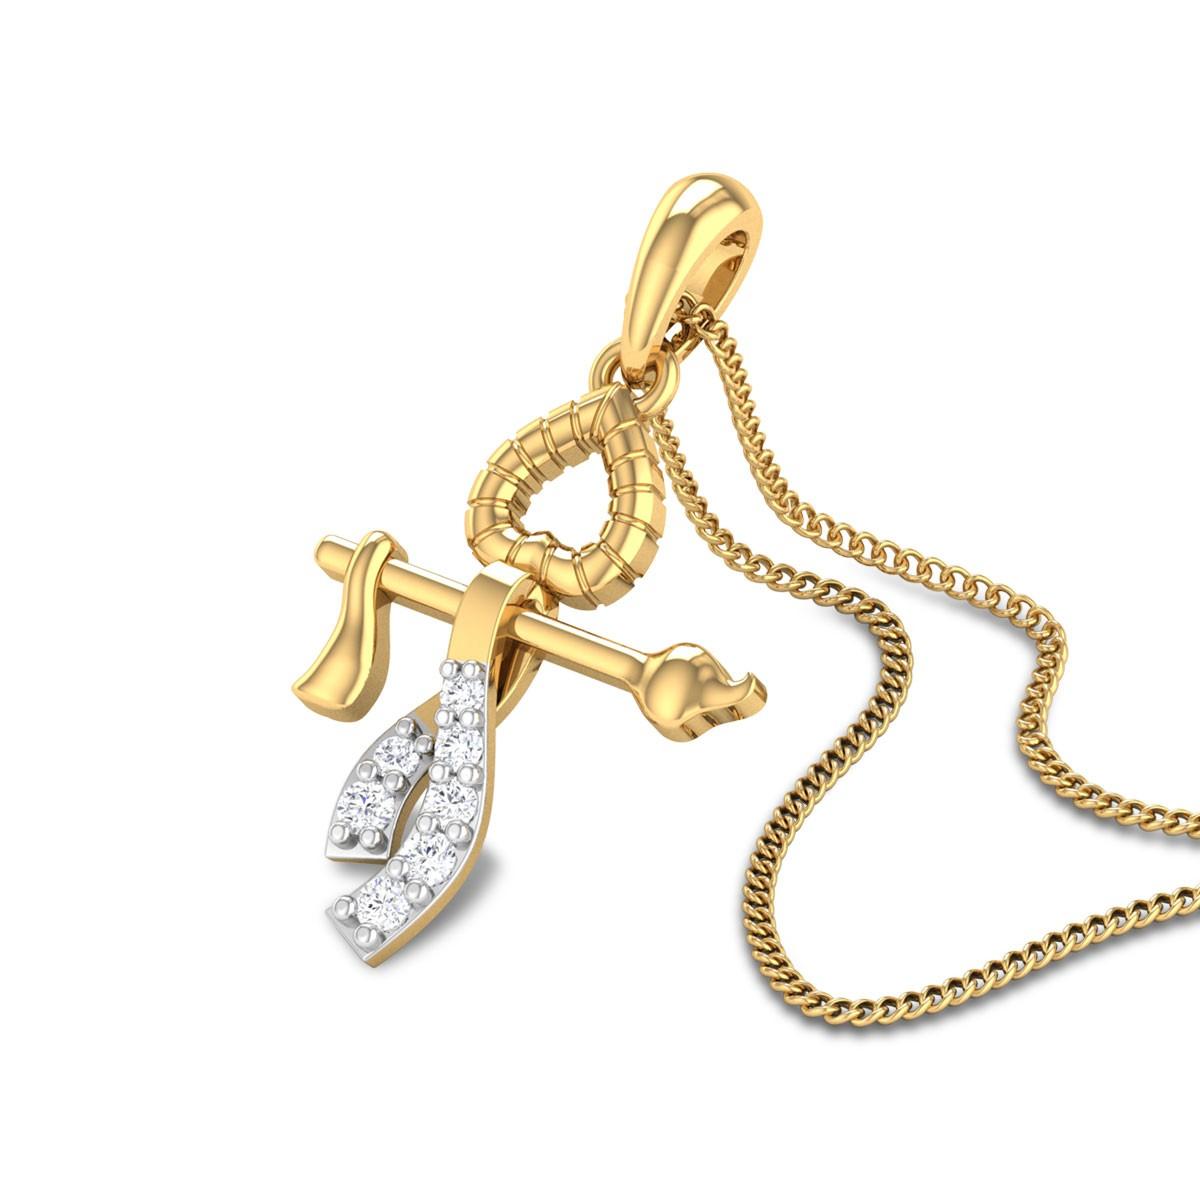 Madhusudan Diamond Pendant